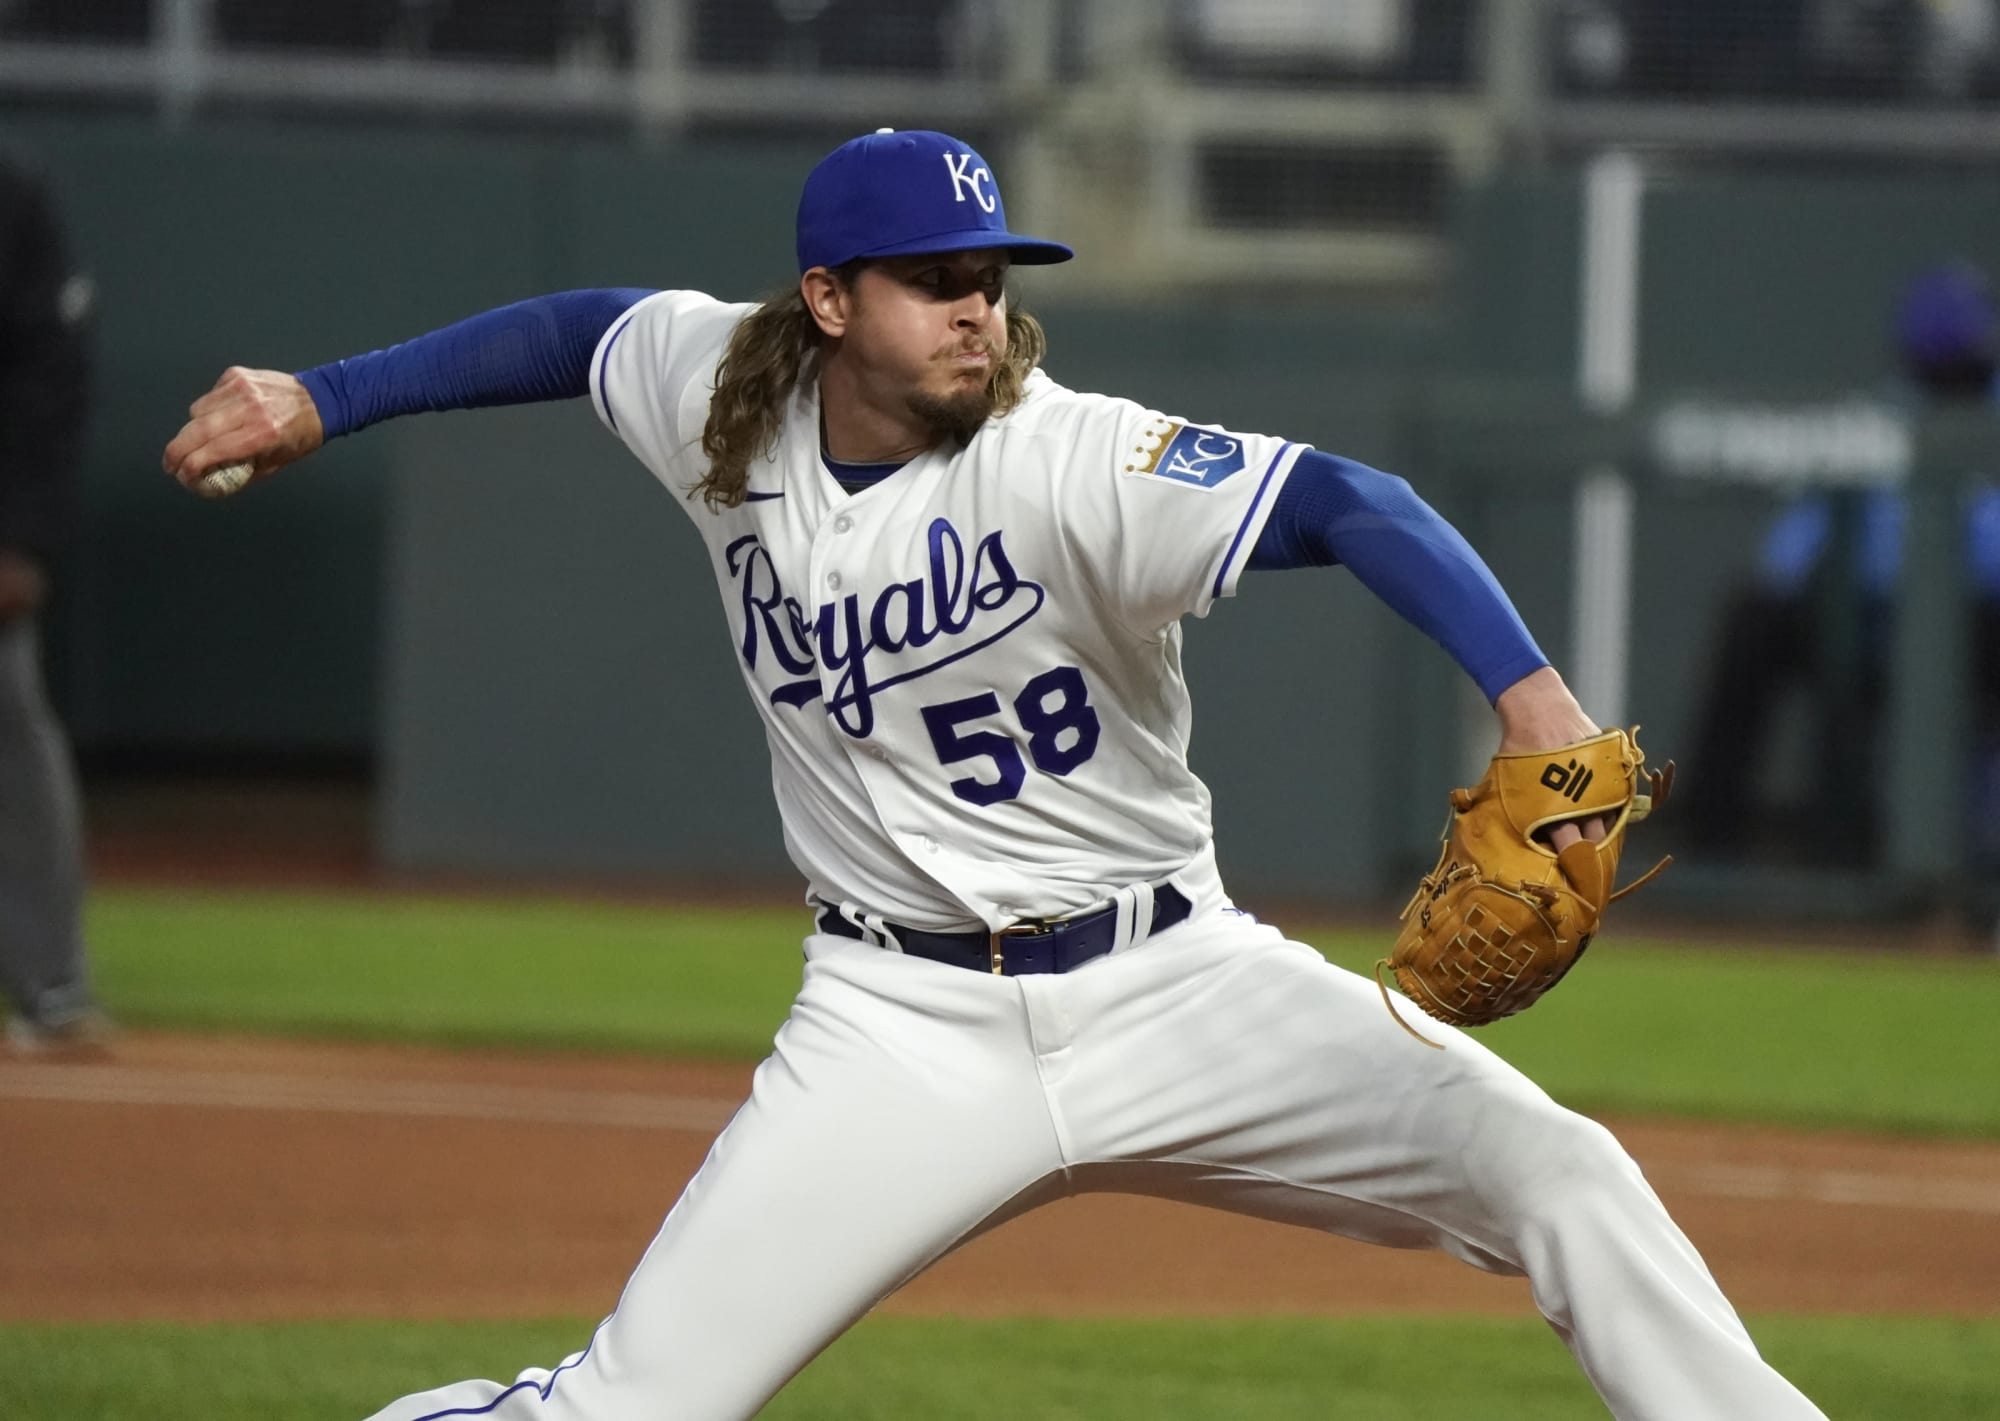 KC Royals: Best trade deadline move was a non-move